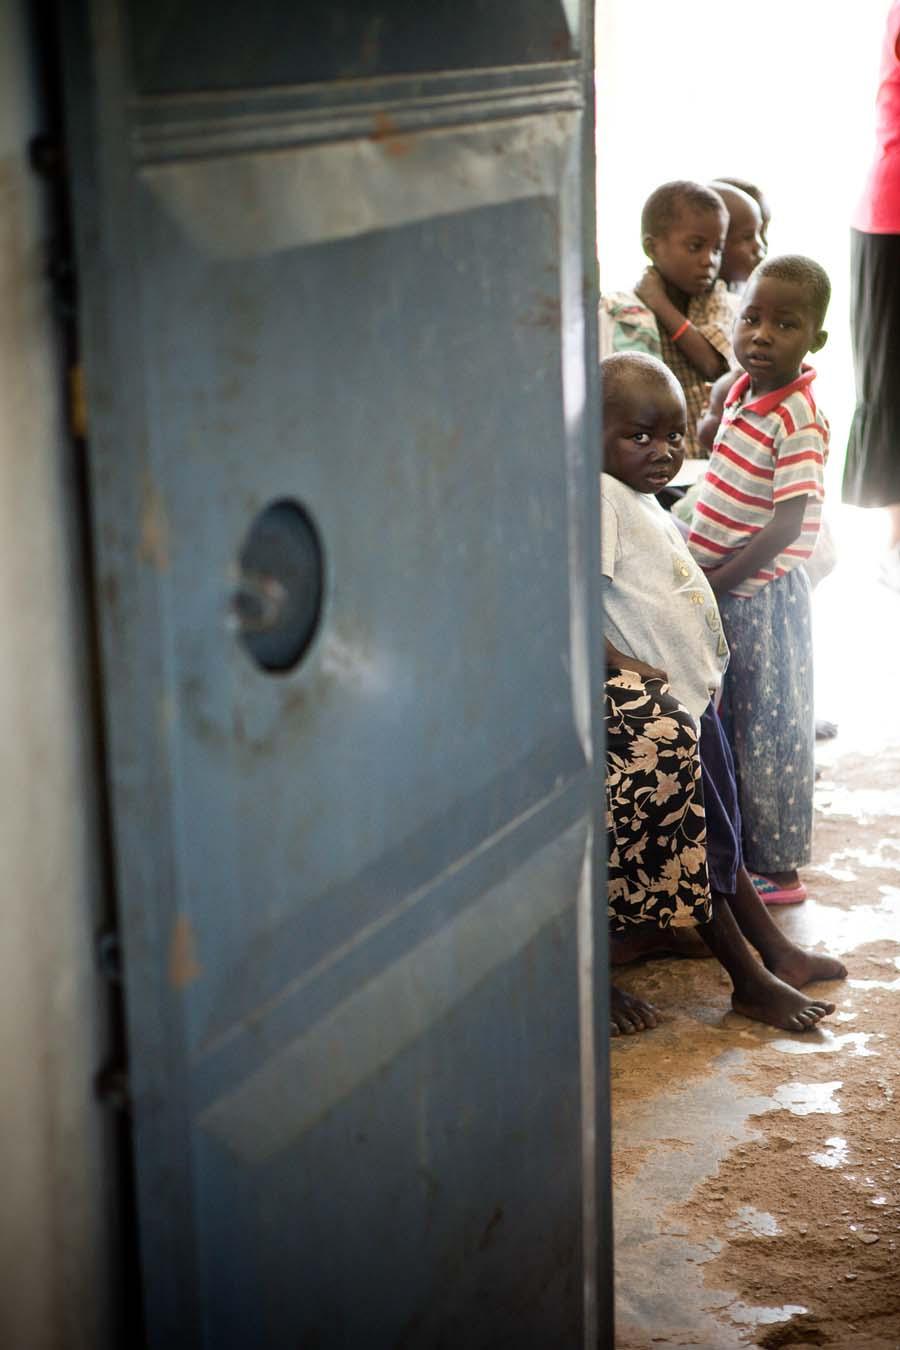 jessicadavisphotography.com | Jessica Davis Photography | Portrait Work in Uganda| Travel Photographer | World Event Photographs 3.jpg